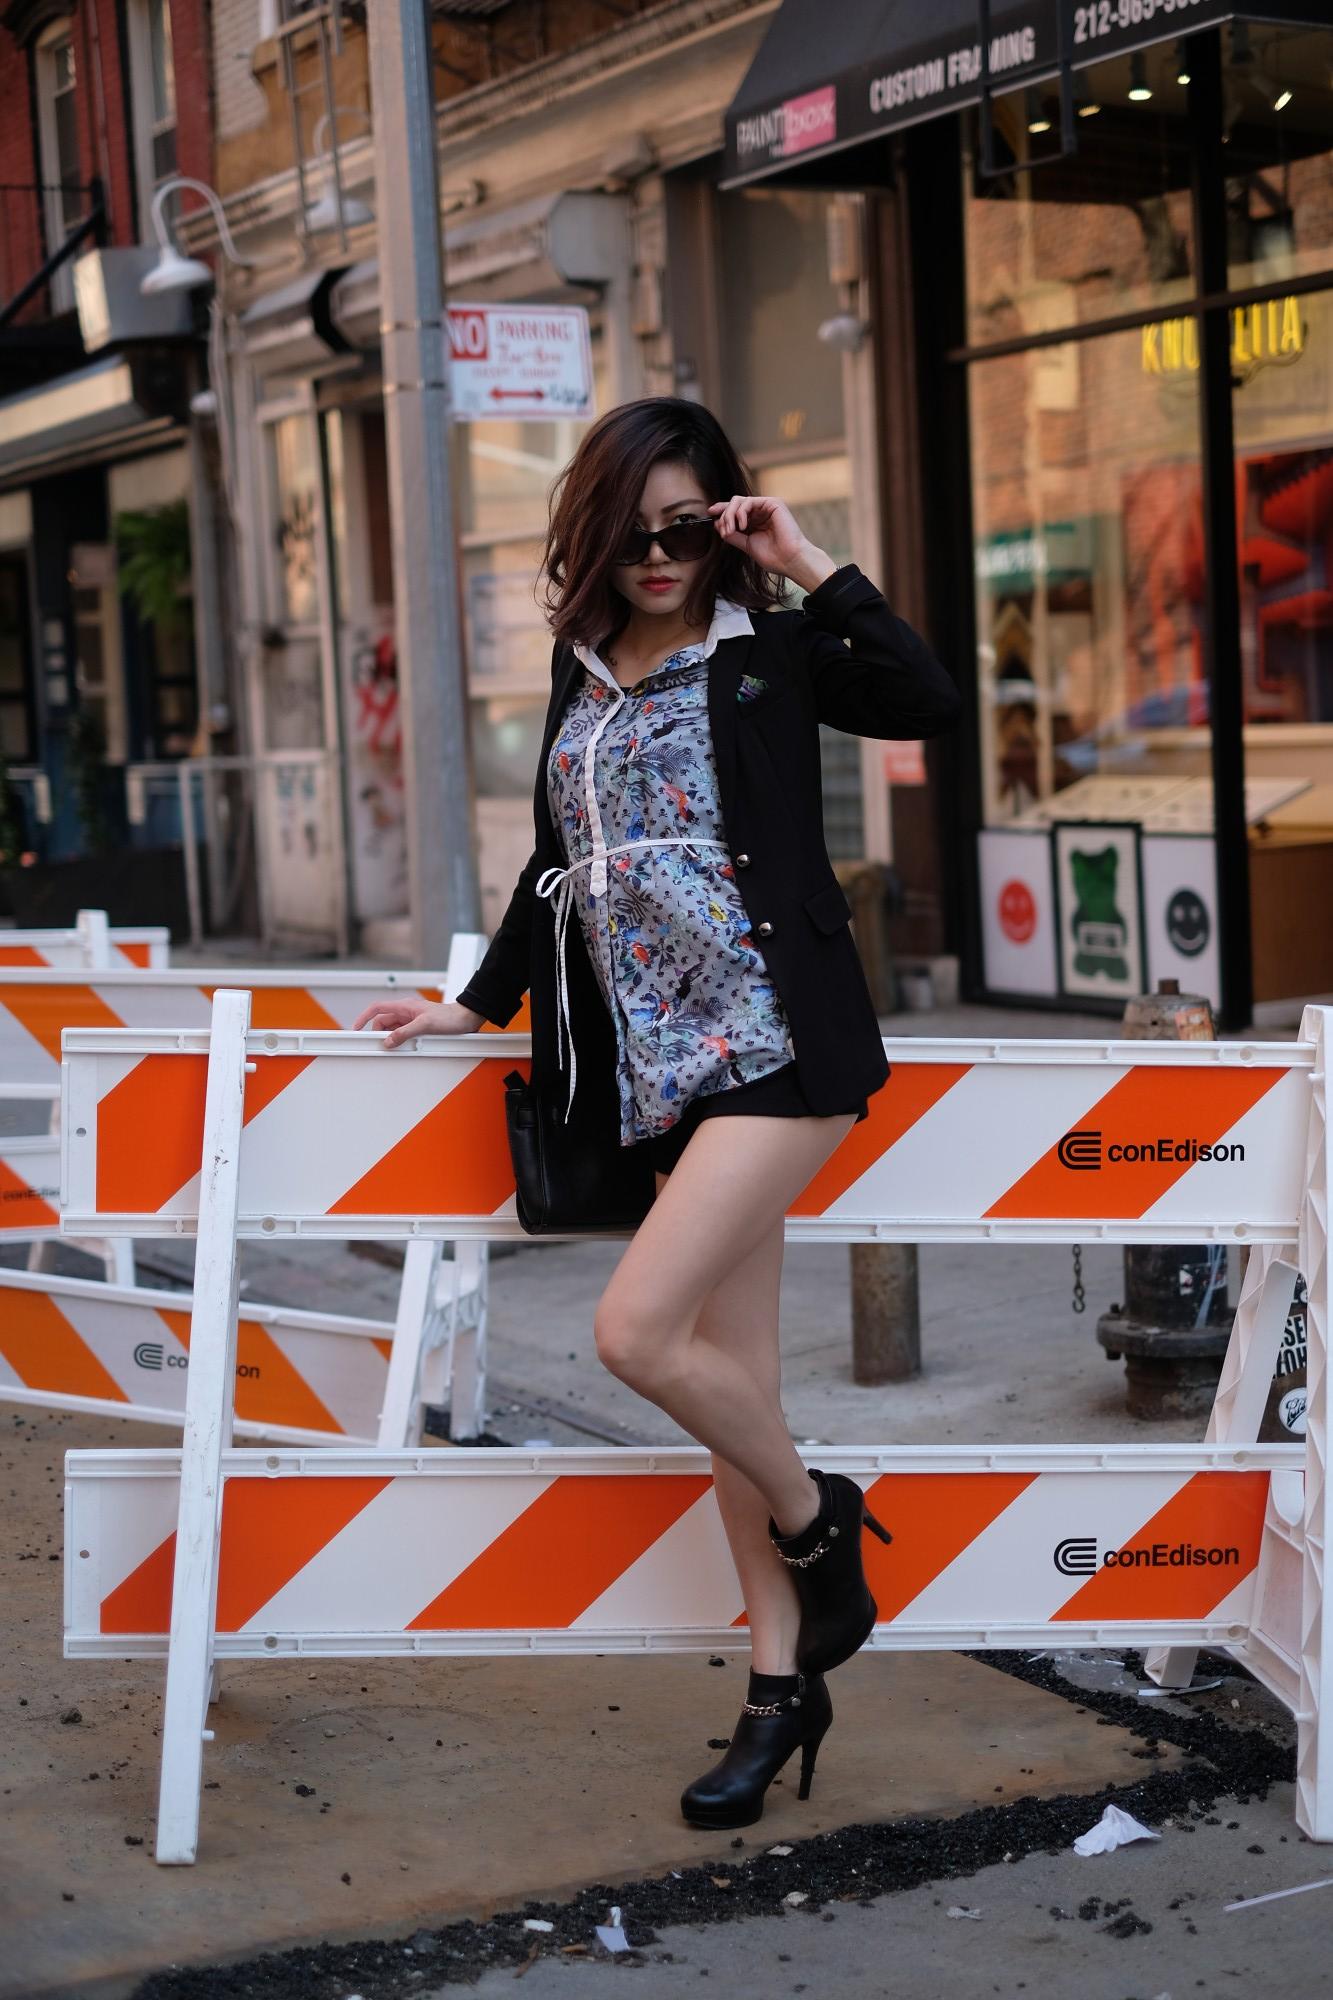 asian model on the street